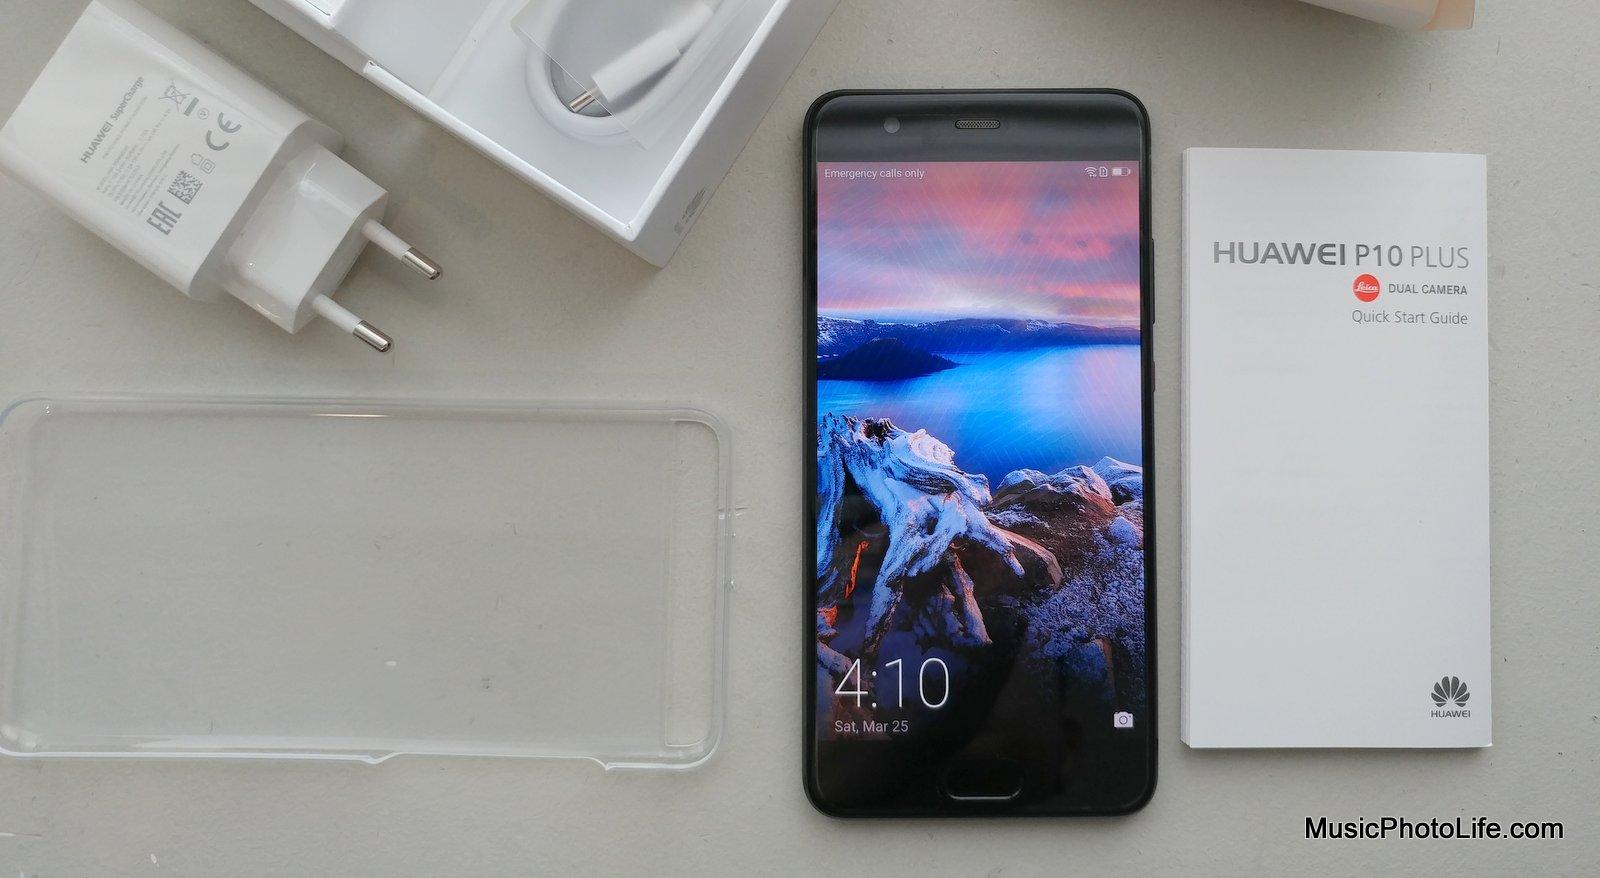 Huawei P10 Plus review by musicphotolife.com